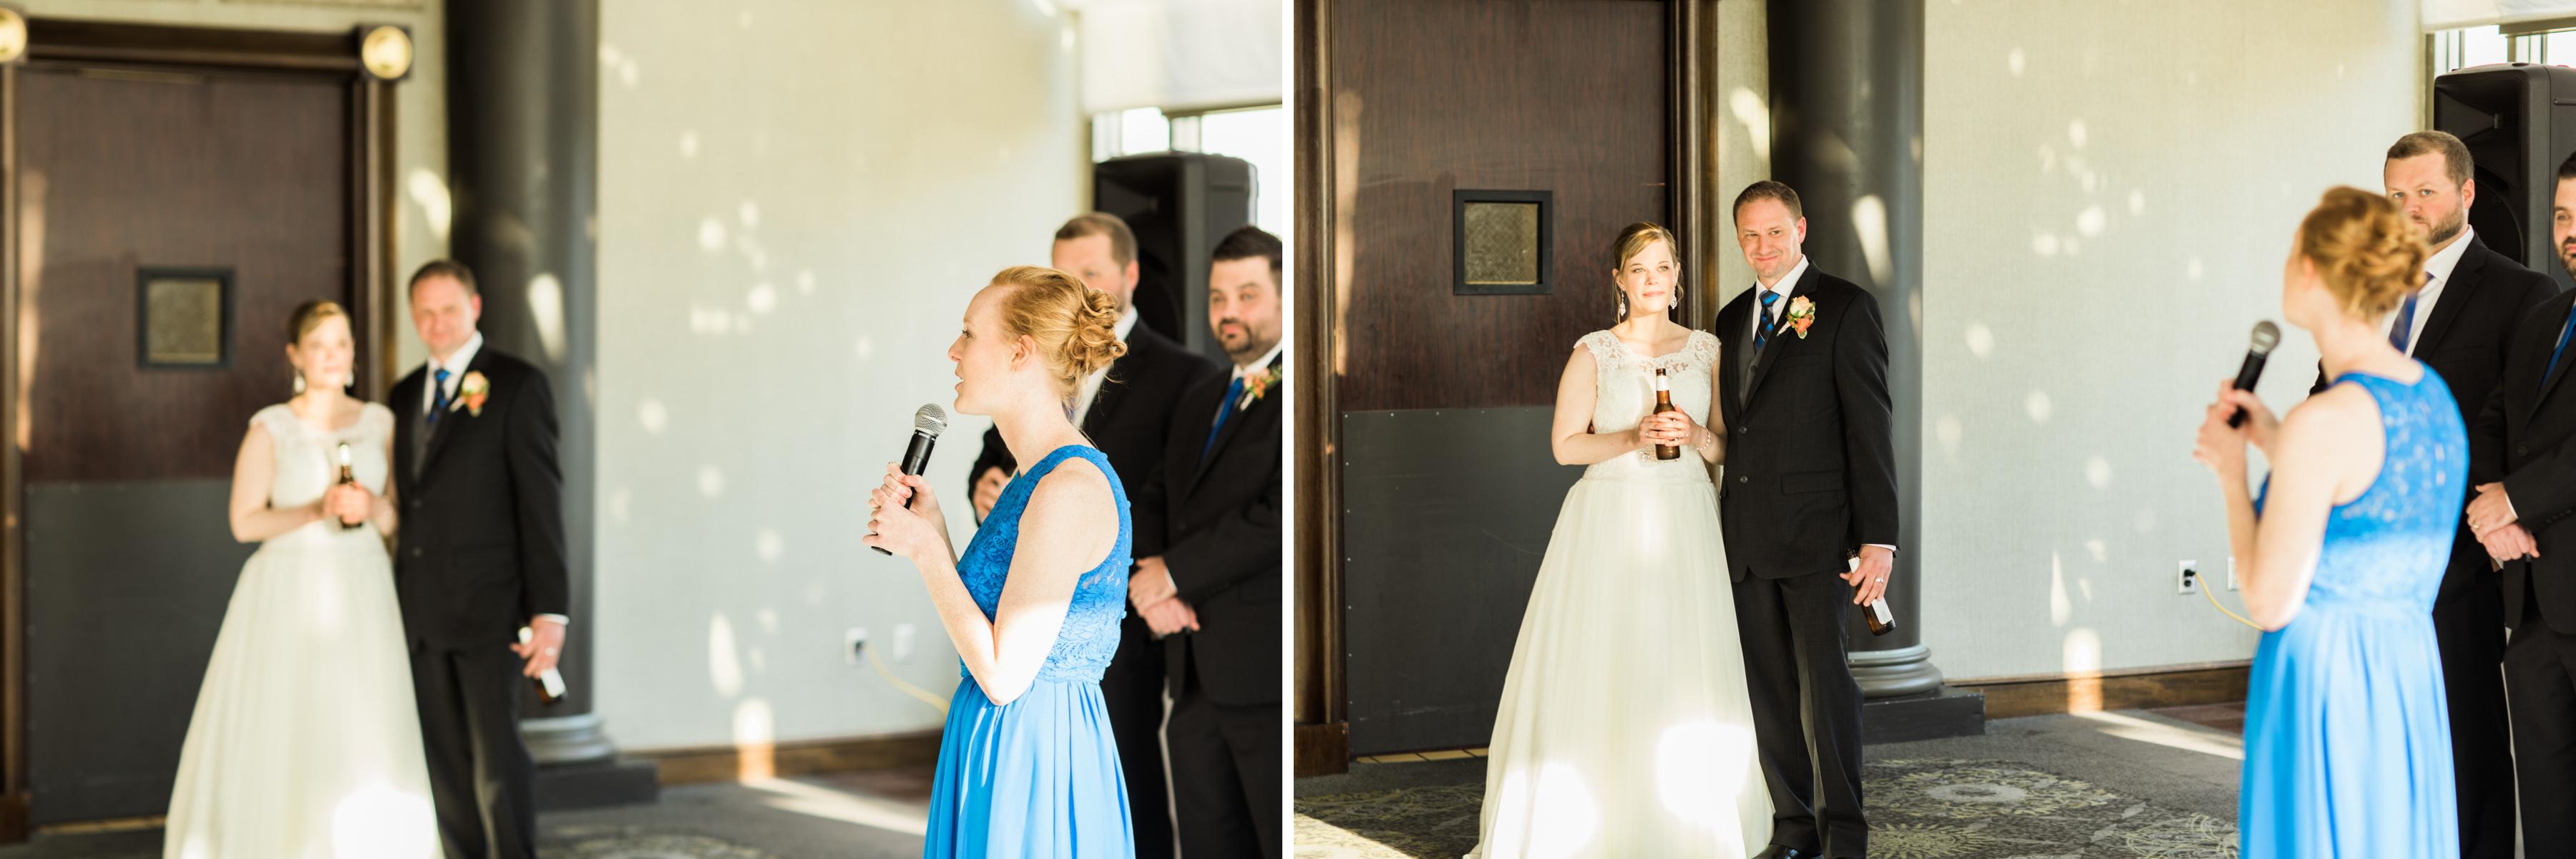 MAULDIN_WEDDING_MONTGOMERY_ALABAMA_WEDDING_PHOTOGRAPHY_108